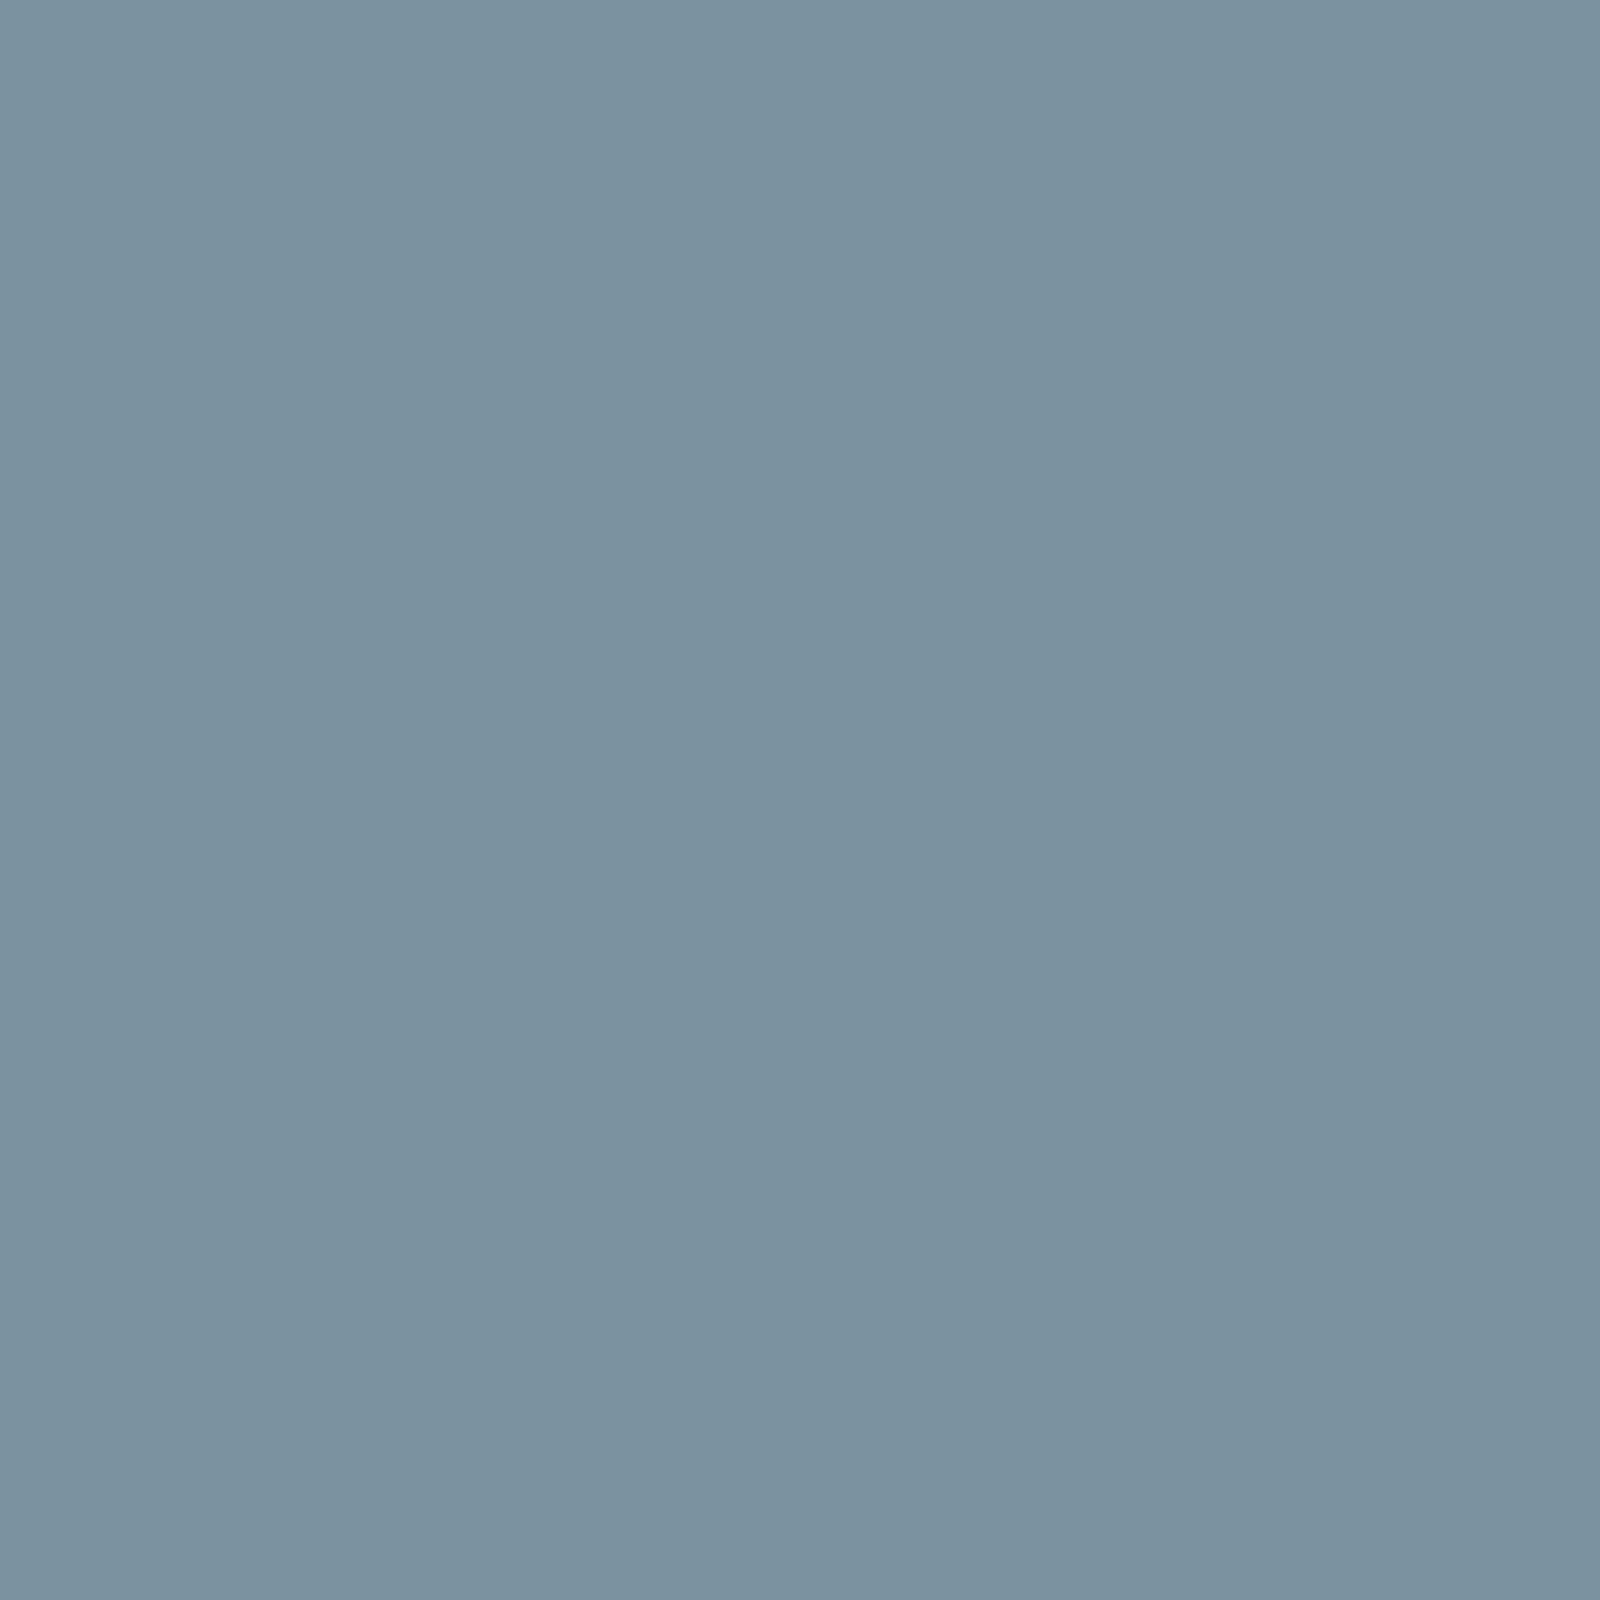 D c fix klebefolie grau seidenmatt 45x200 cm dekor for Klebefolie grau